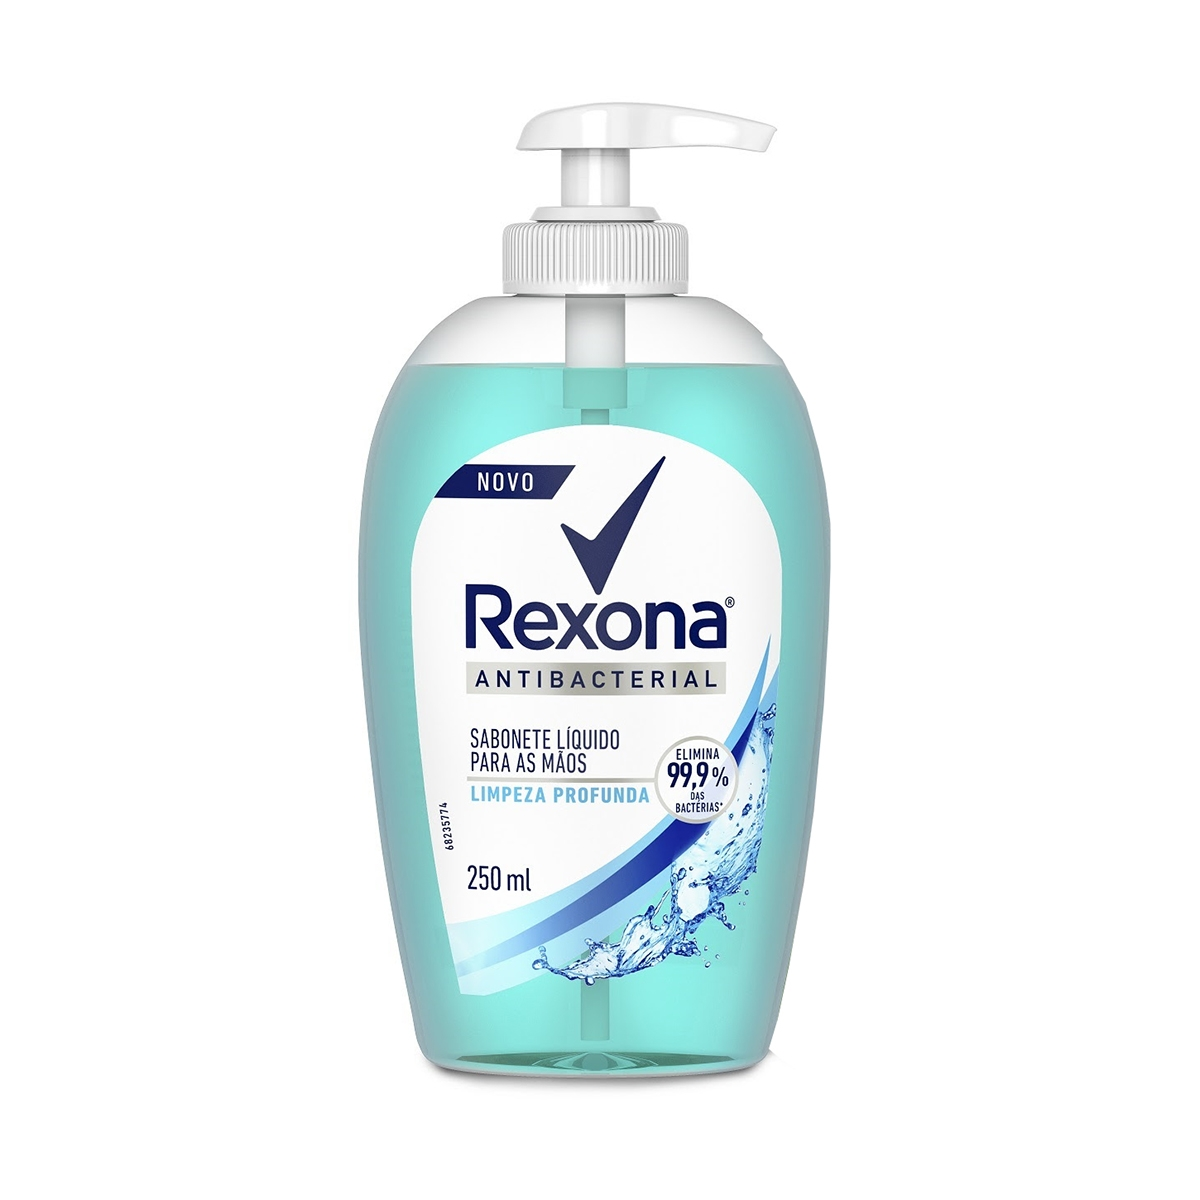 Sabonete Líquido para Mãos Rexona Antibacterial Limpeza Profunda 250ml